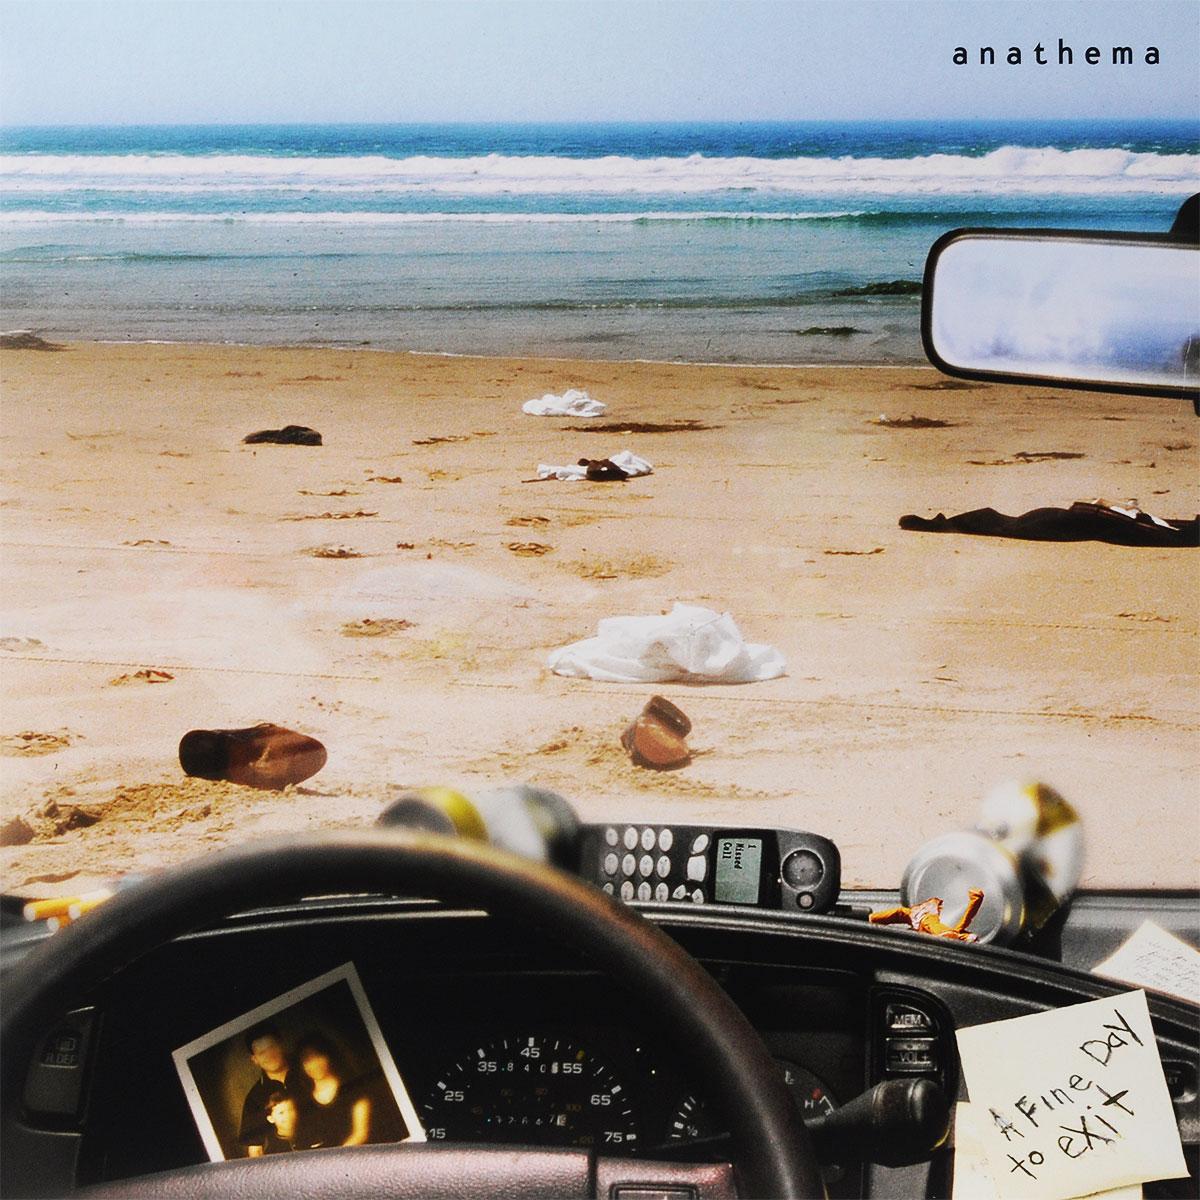 Anathema Anathema. A Fine Day To Exit (LP + CD) декоративные украшения exit day jyy258